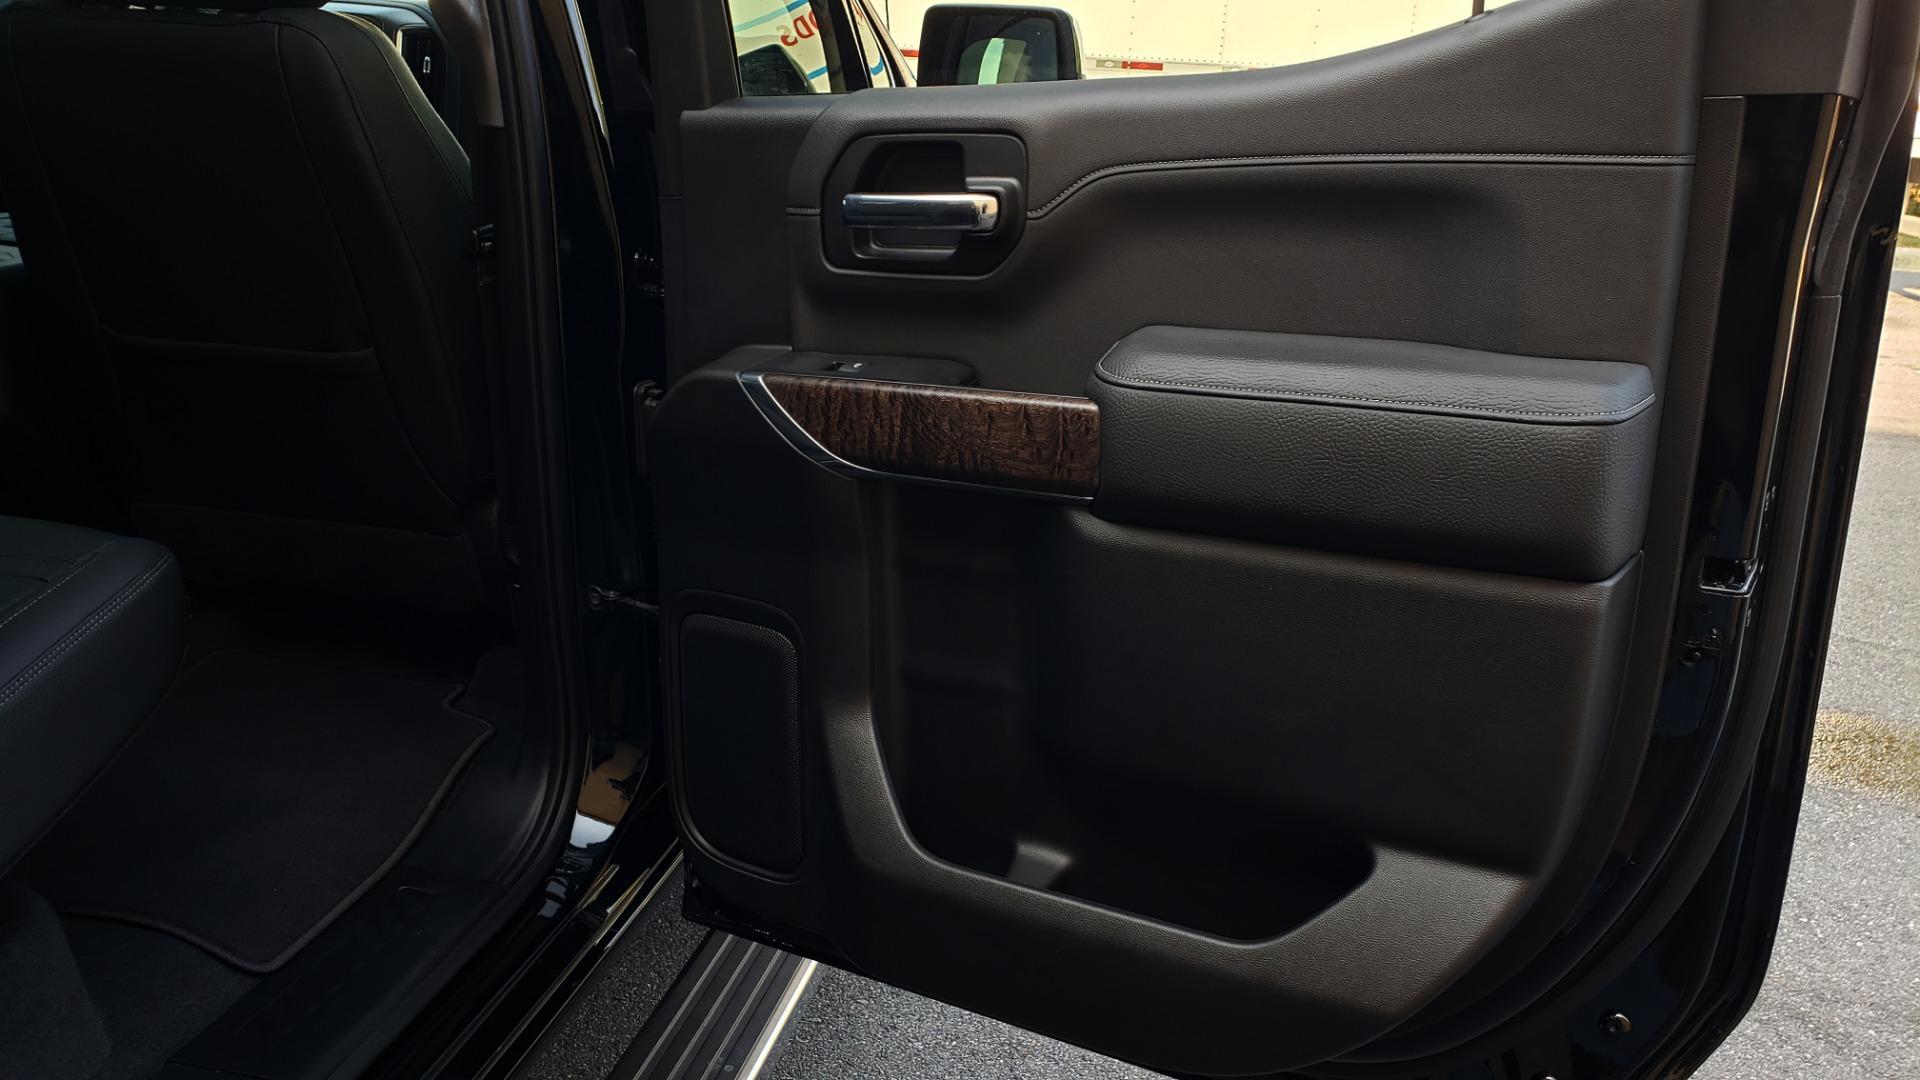 Used 2019 GMC SIERRA 1500 DENALI ULTIMATE 4WD / NAV / TECH PKG / DRVR ALRT for sale Sold at Formula Imports in Charlotte NC 28227 75